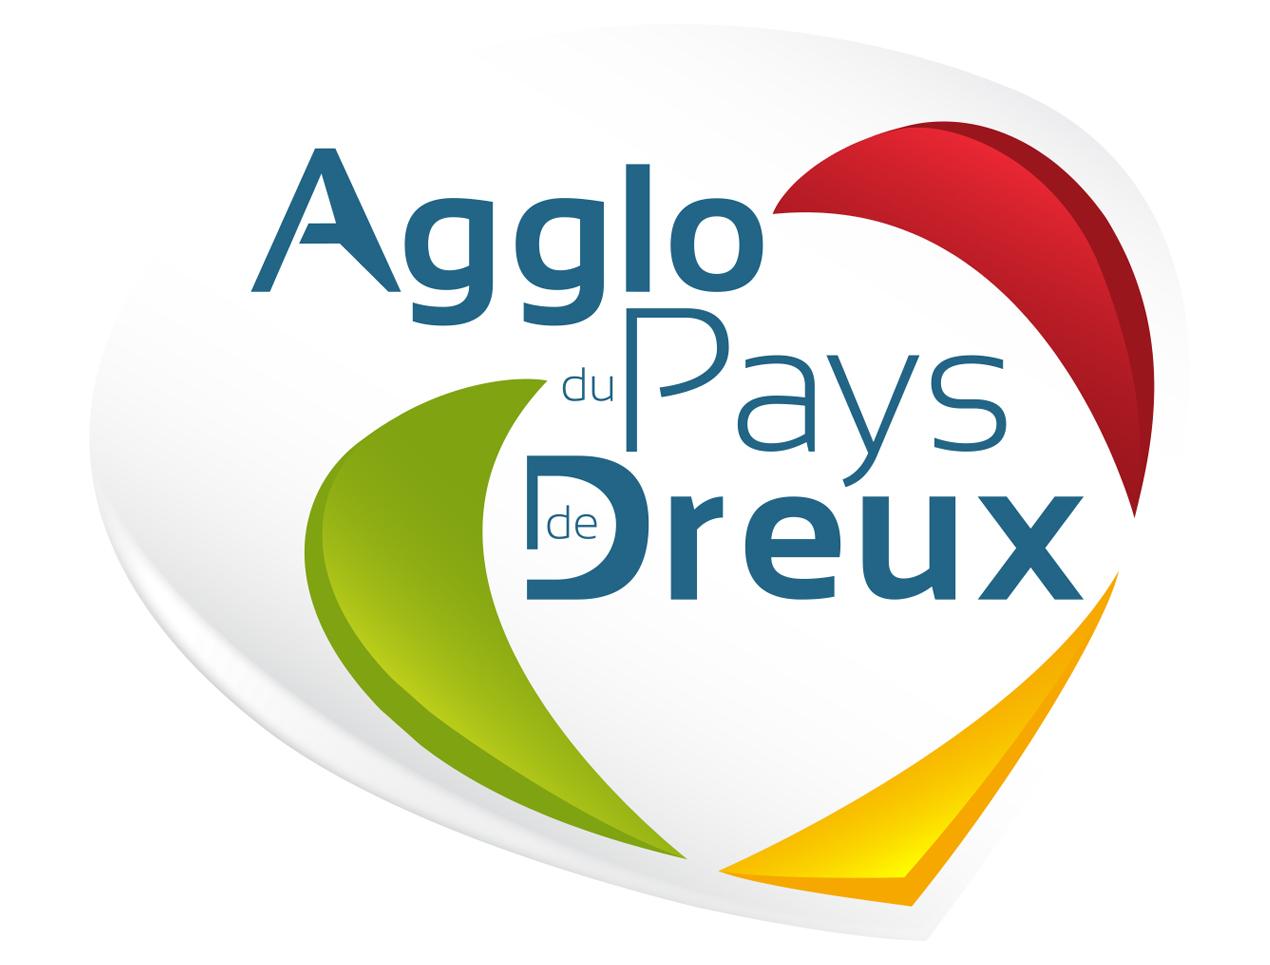 LOGO_Agglo_Pays_Dreux_RVB